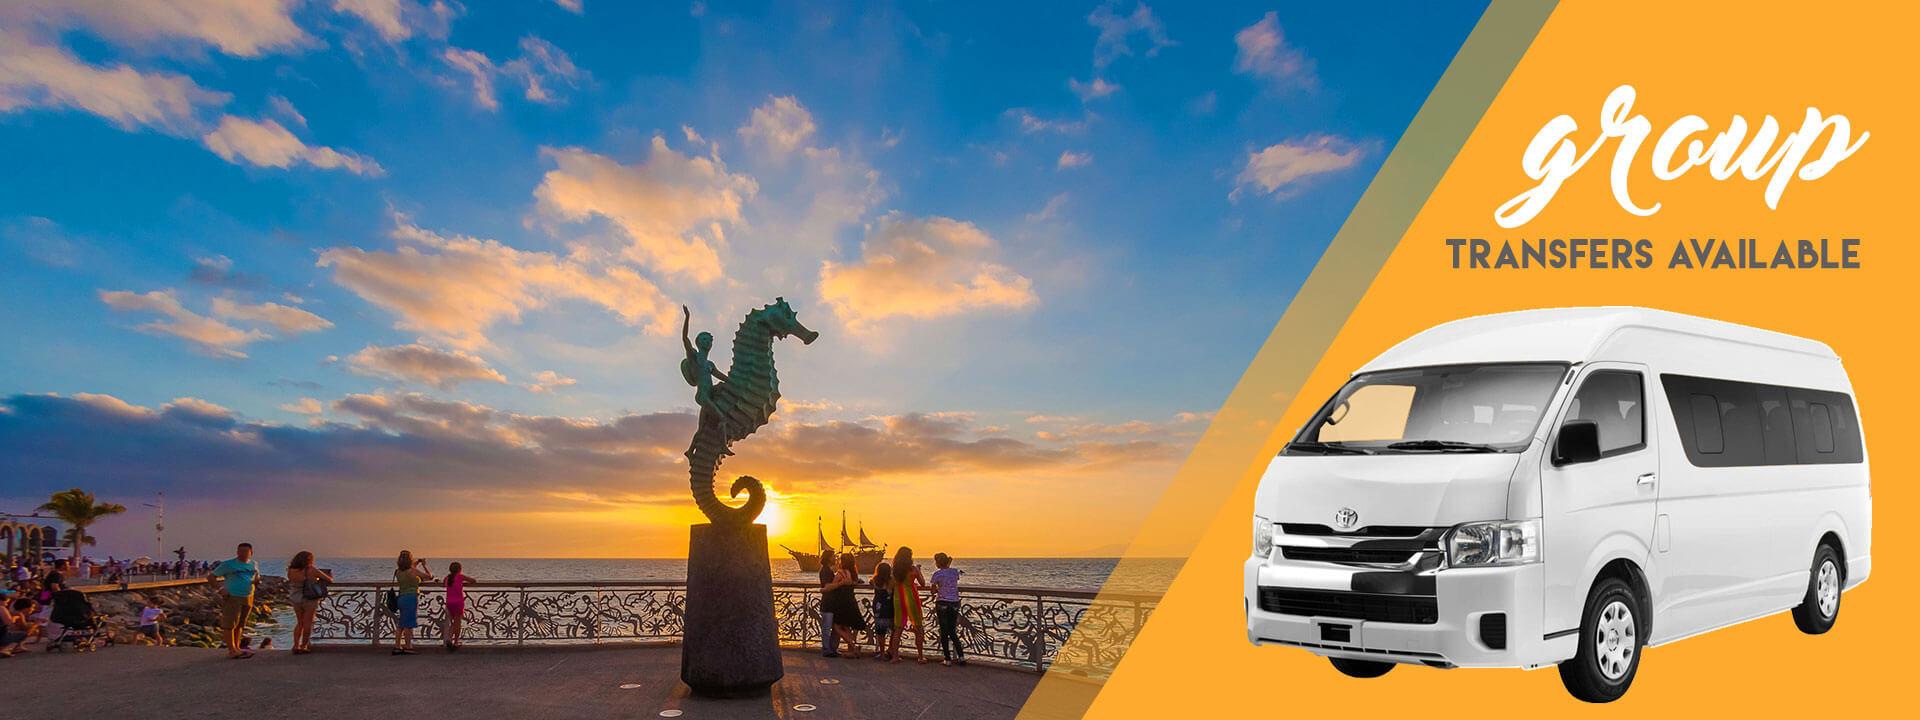 Puerto Vallarta Group transportation available